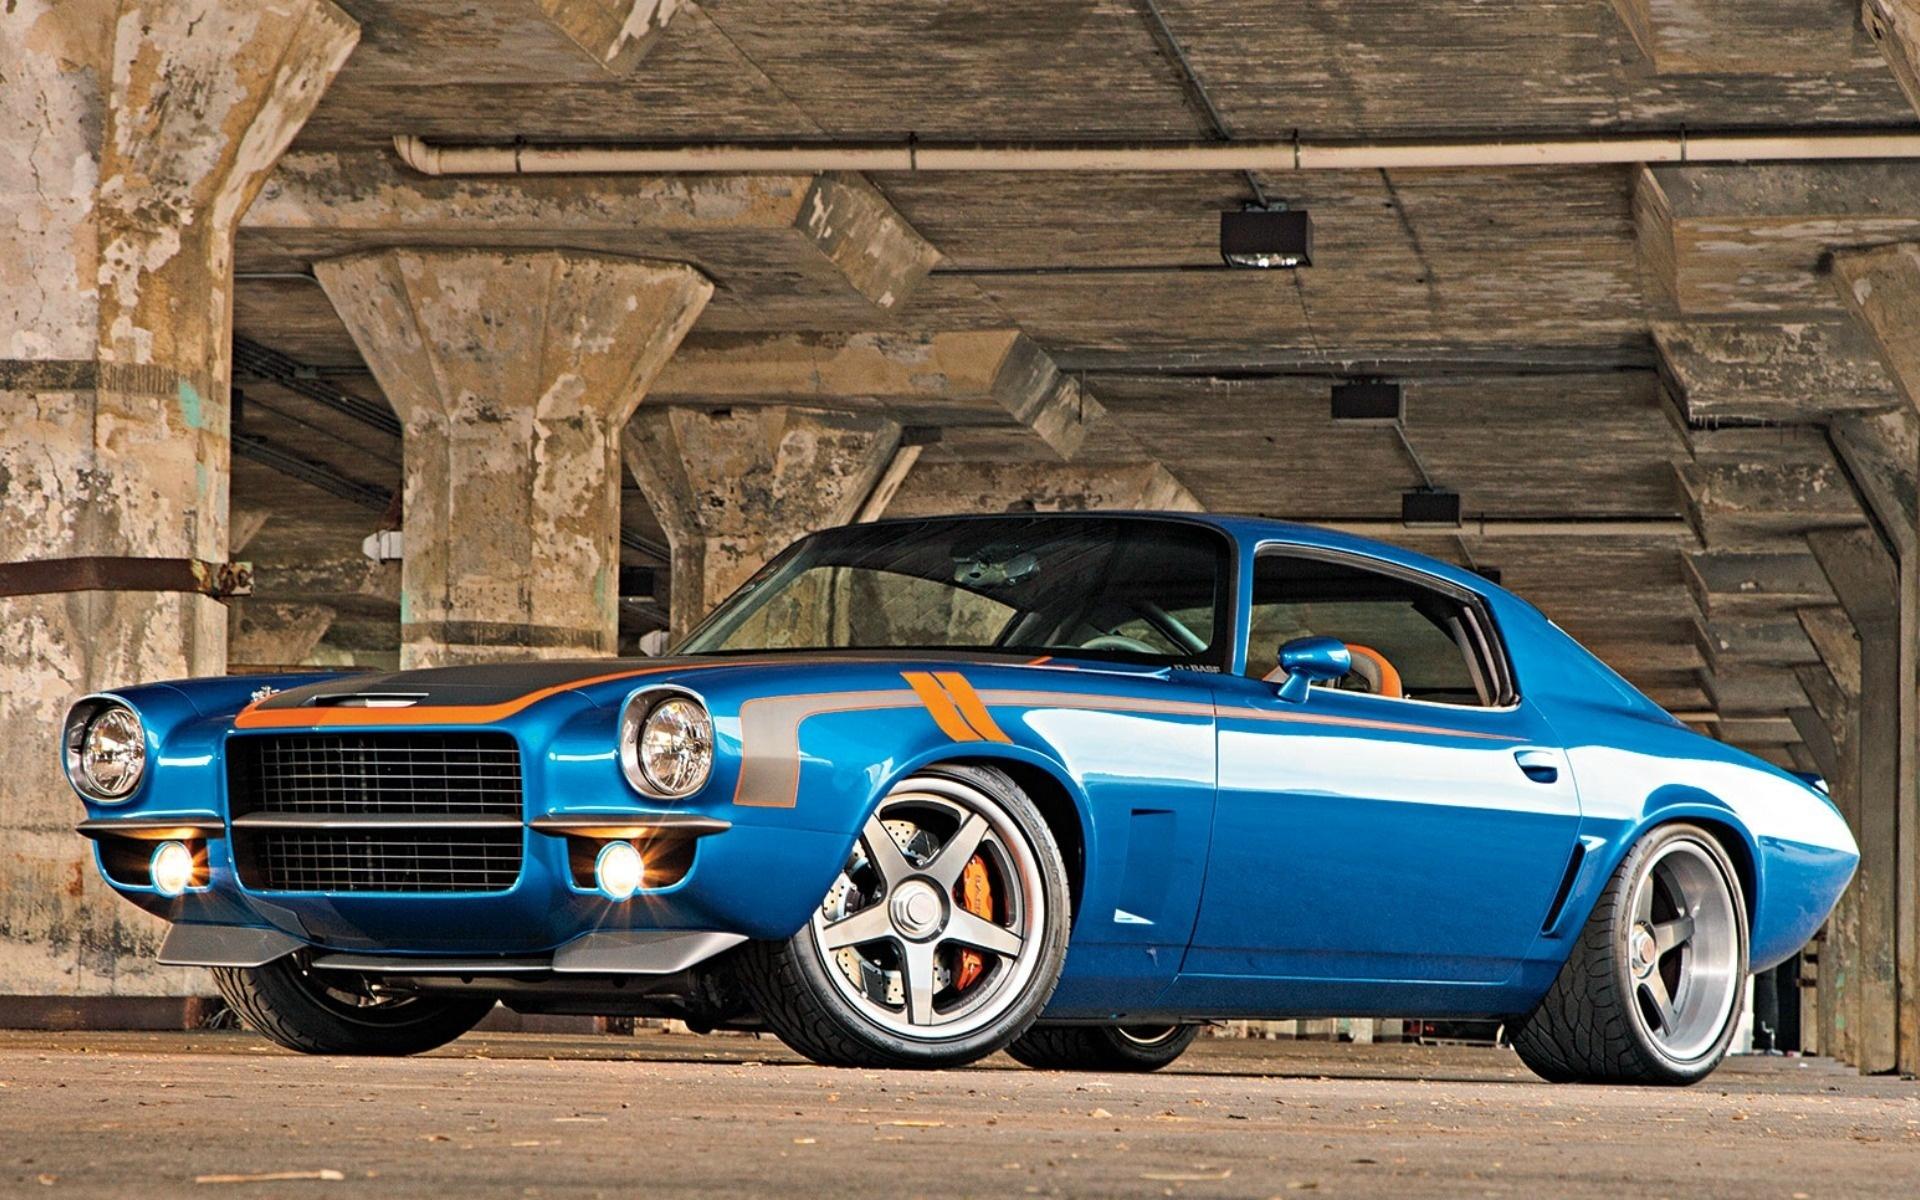 Tuning Chevrolet Camaro Hot Rod Muscle Cars Wallpaper